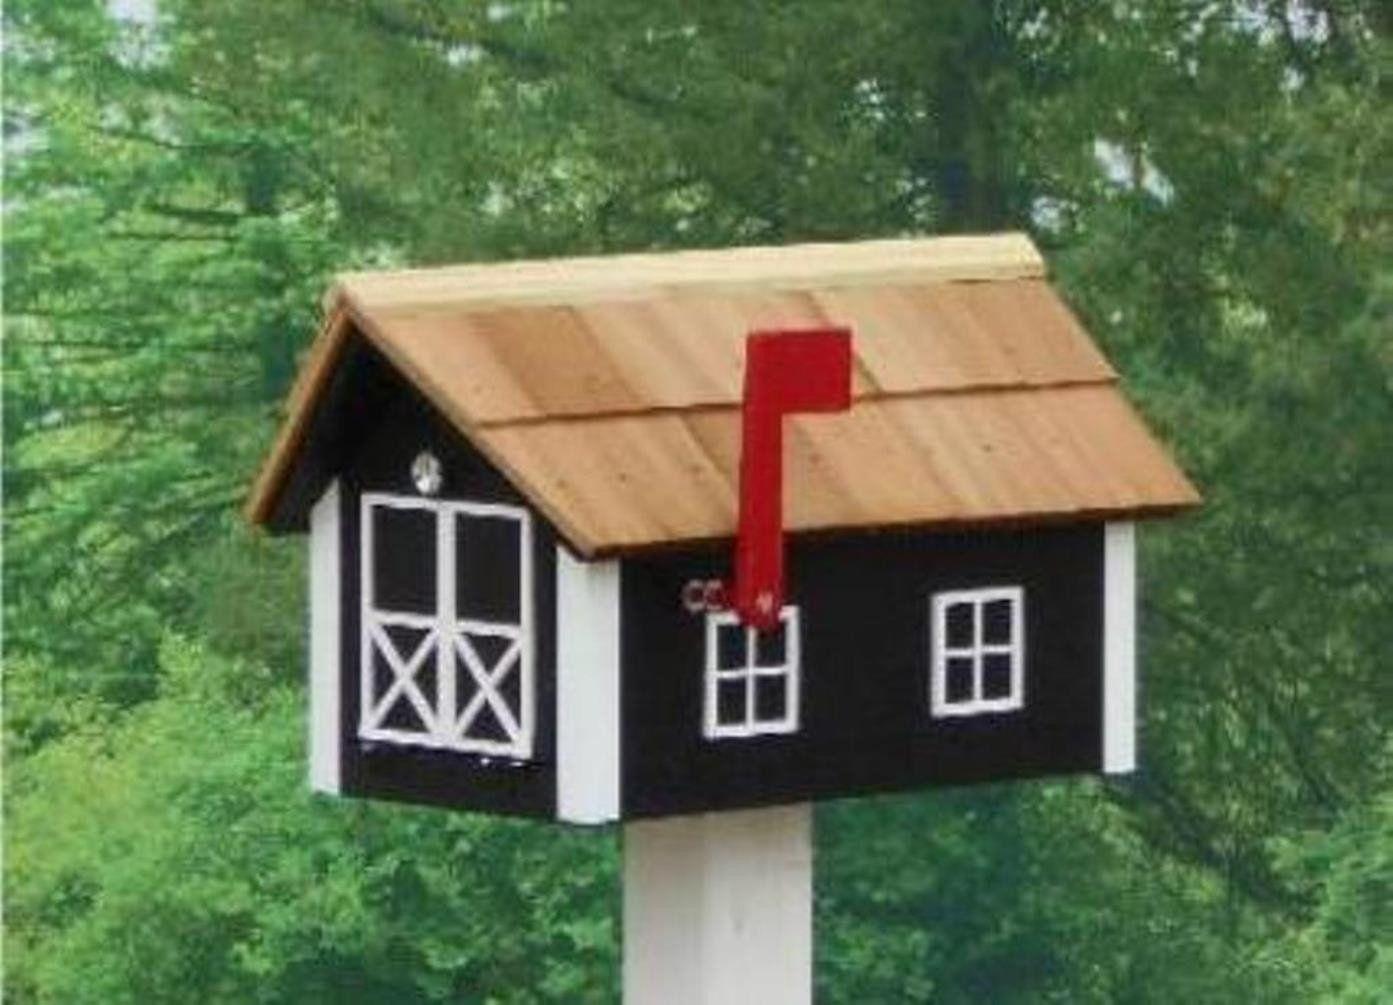 Best Amish Made Painted Mailbox Wooden Mailbox Mailbox Amish 400 x 300